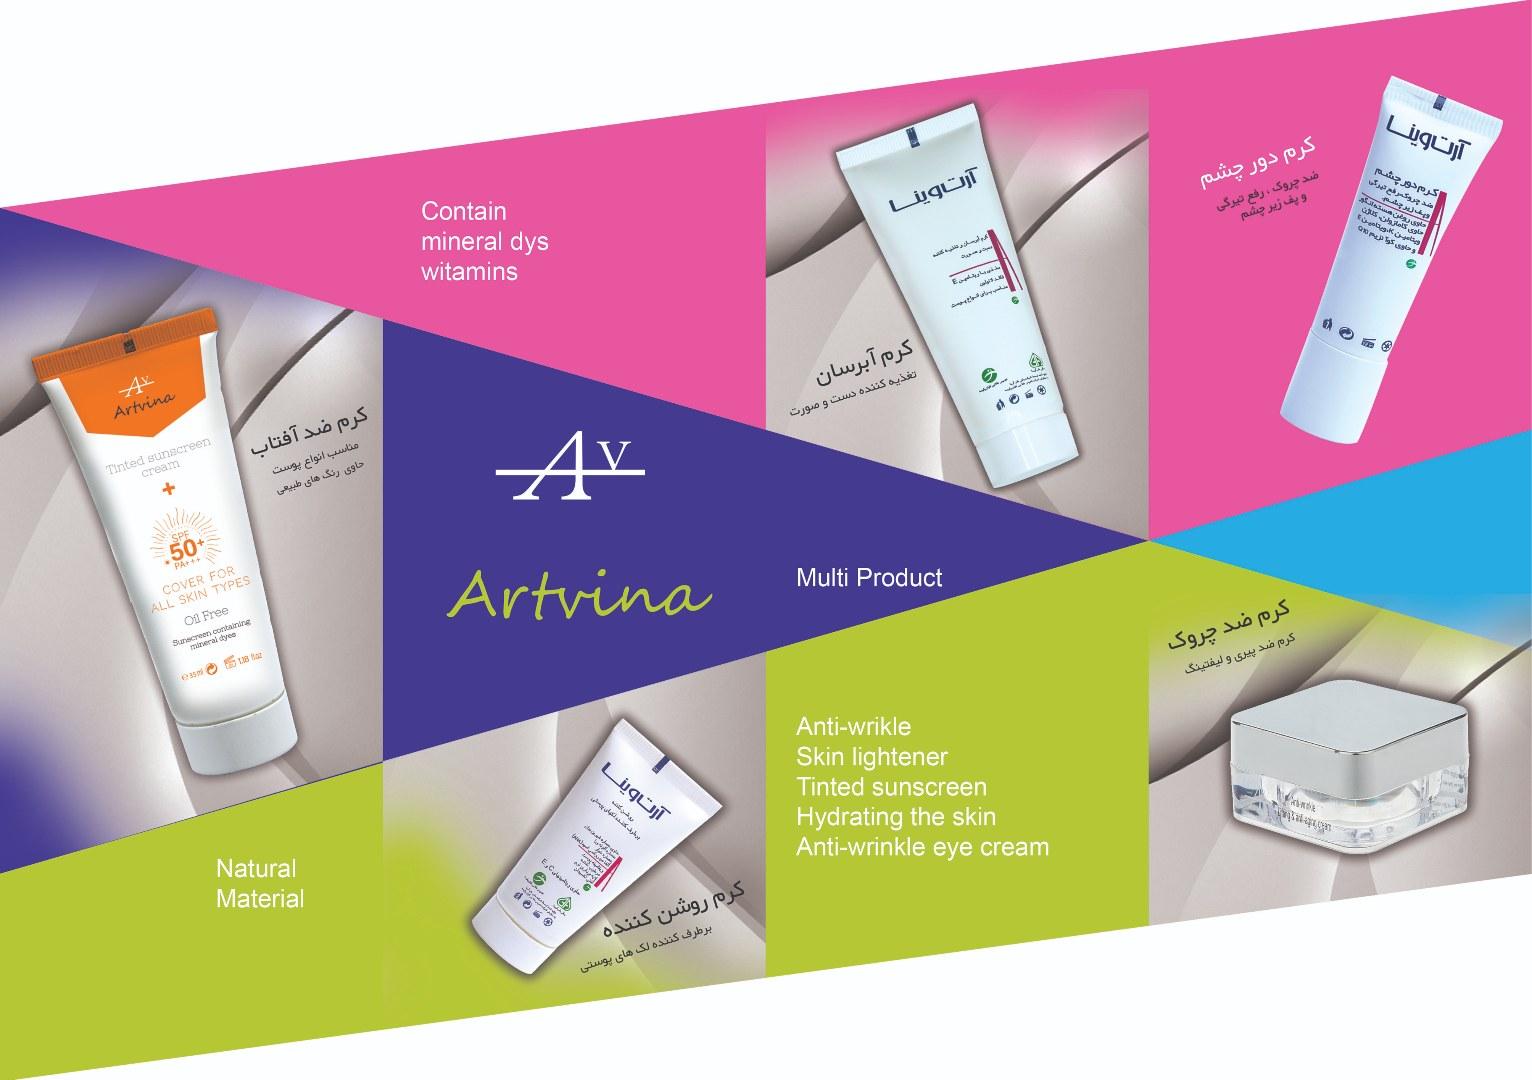 Molti Products Artvina